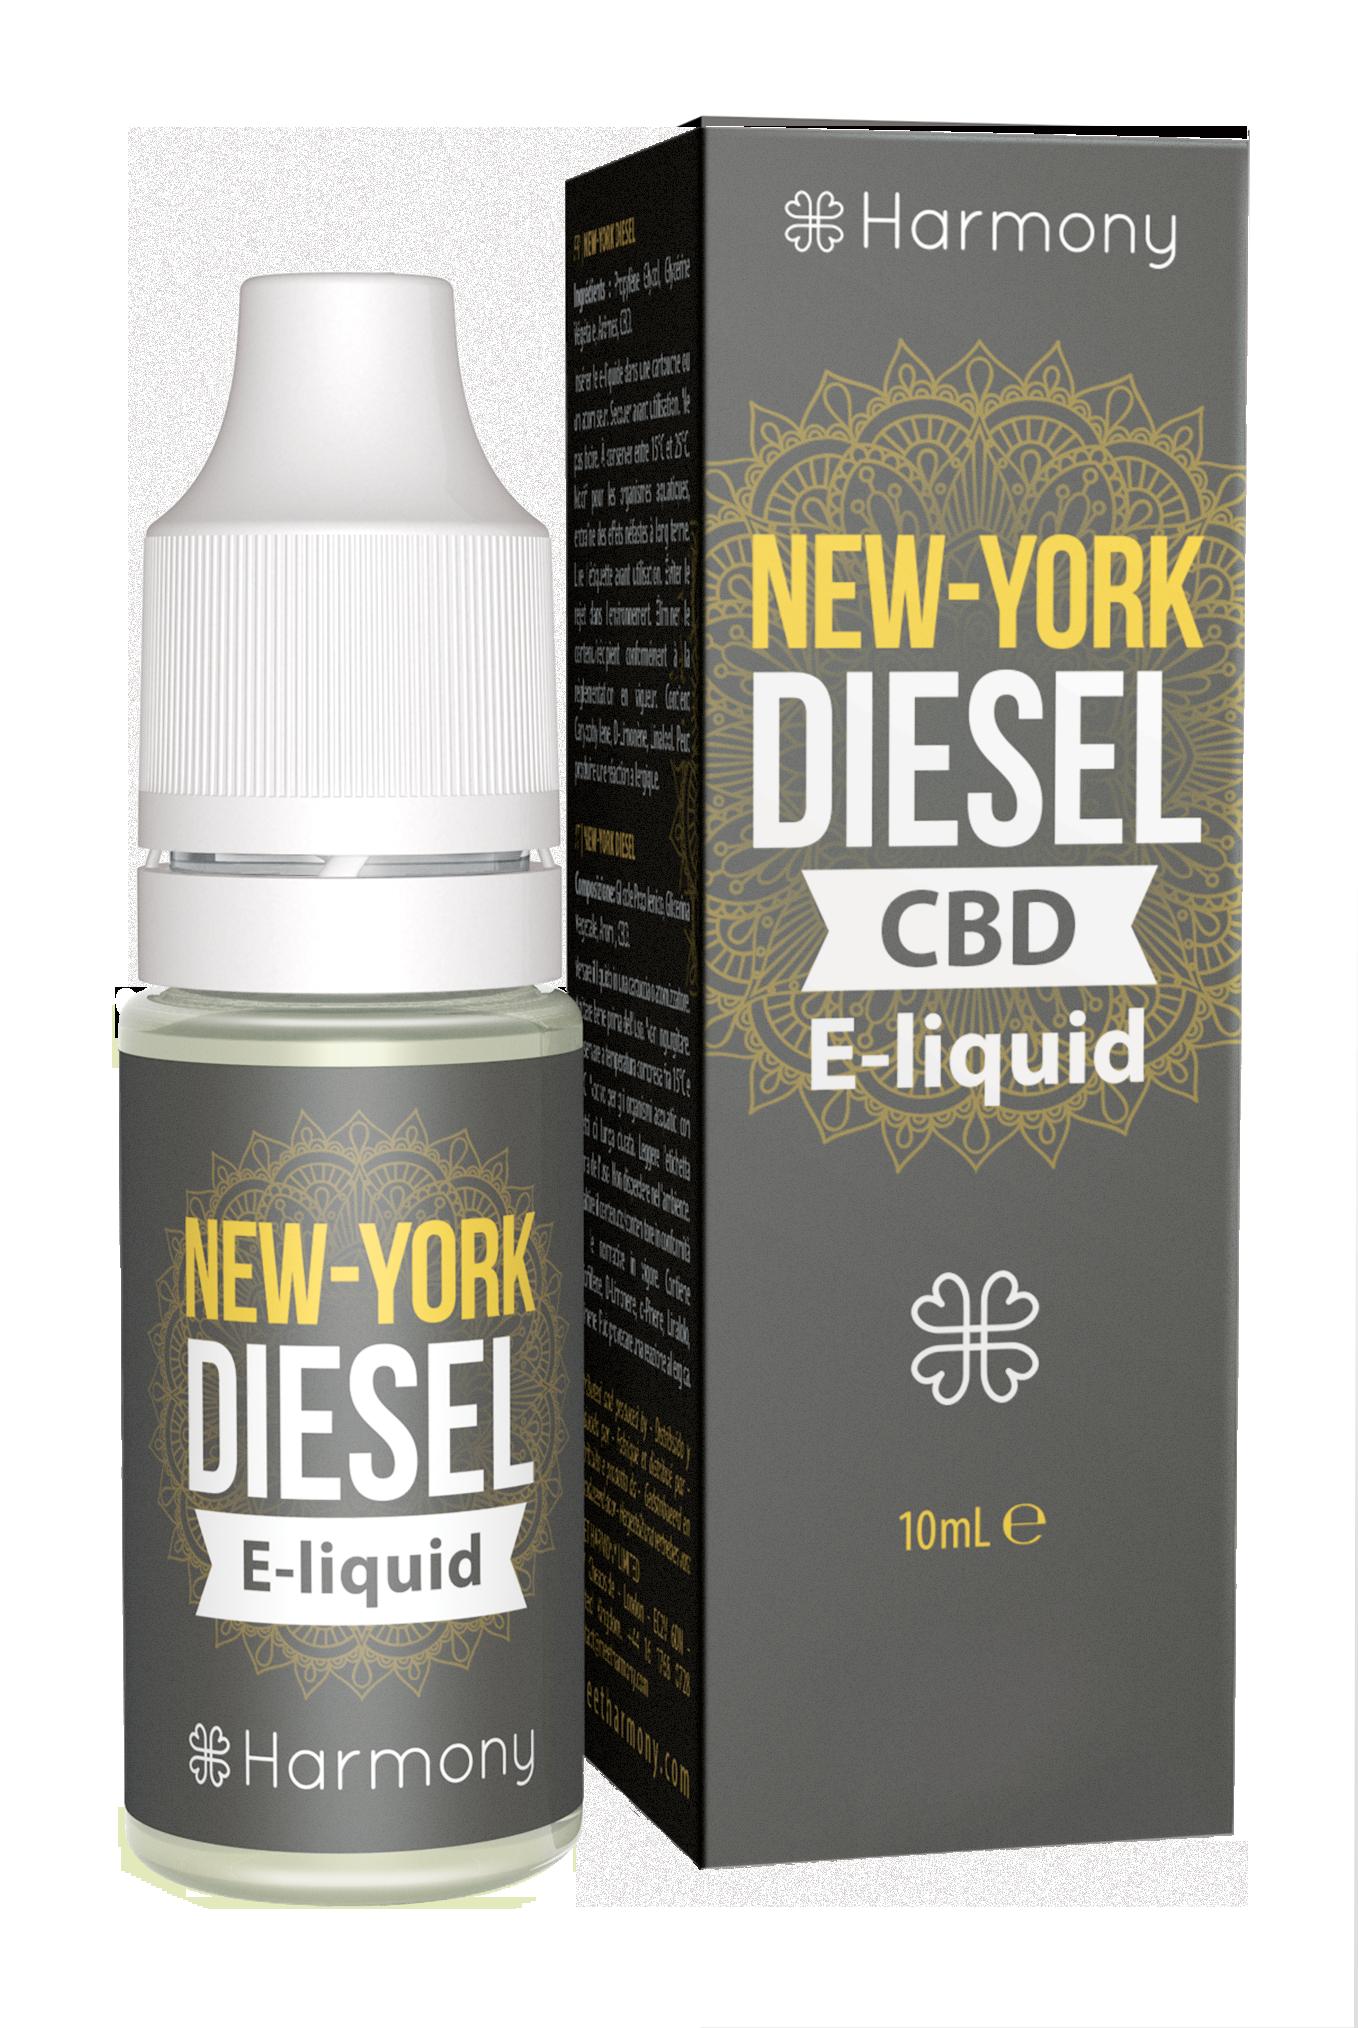 Harmony CBD E-Liquid - 30mg CBD - Geschmackssorte N.Y. Diesel - 10ml